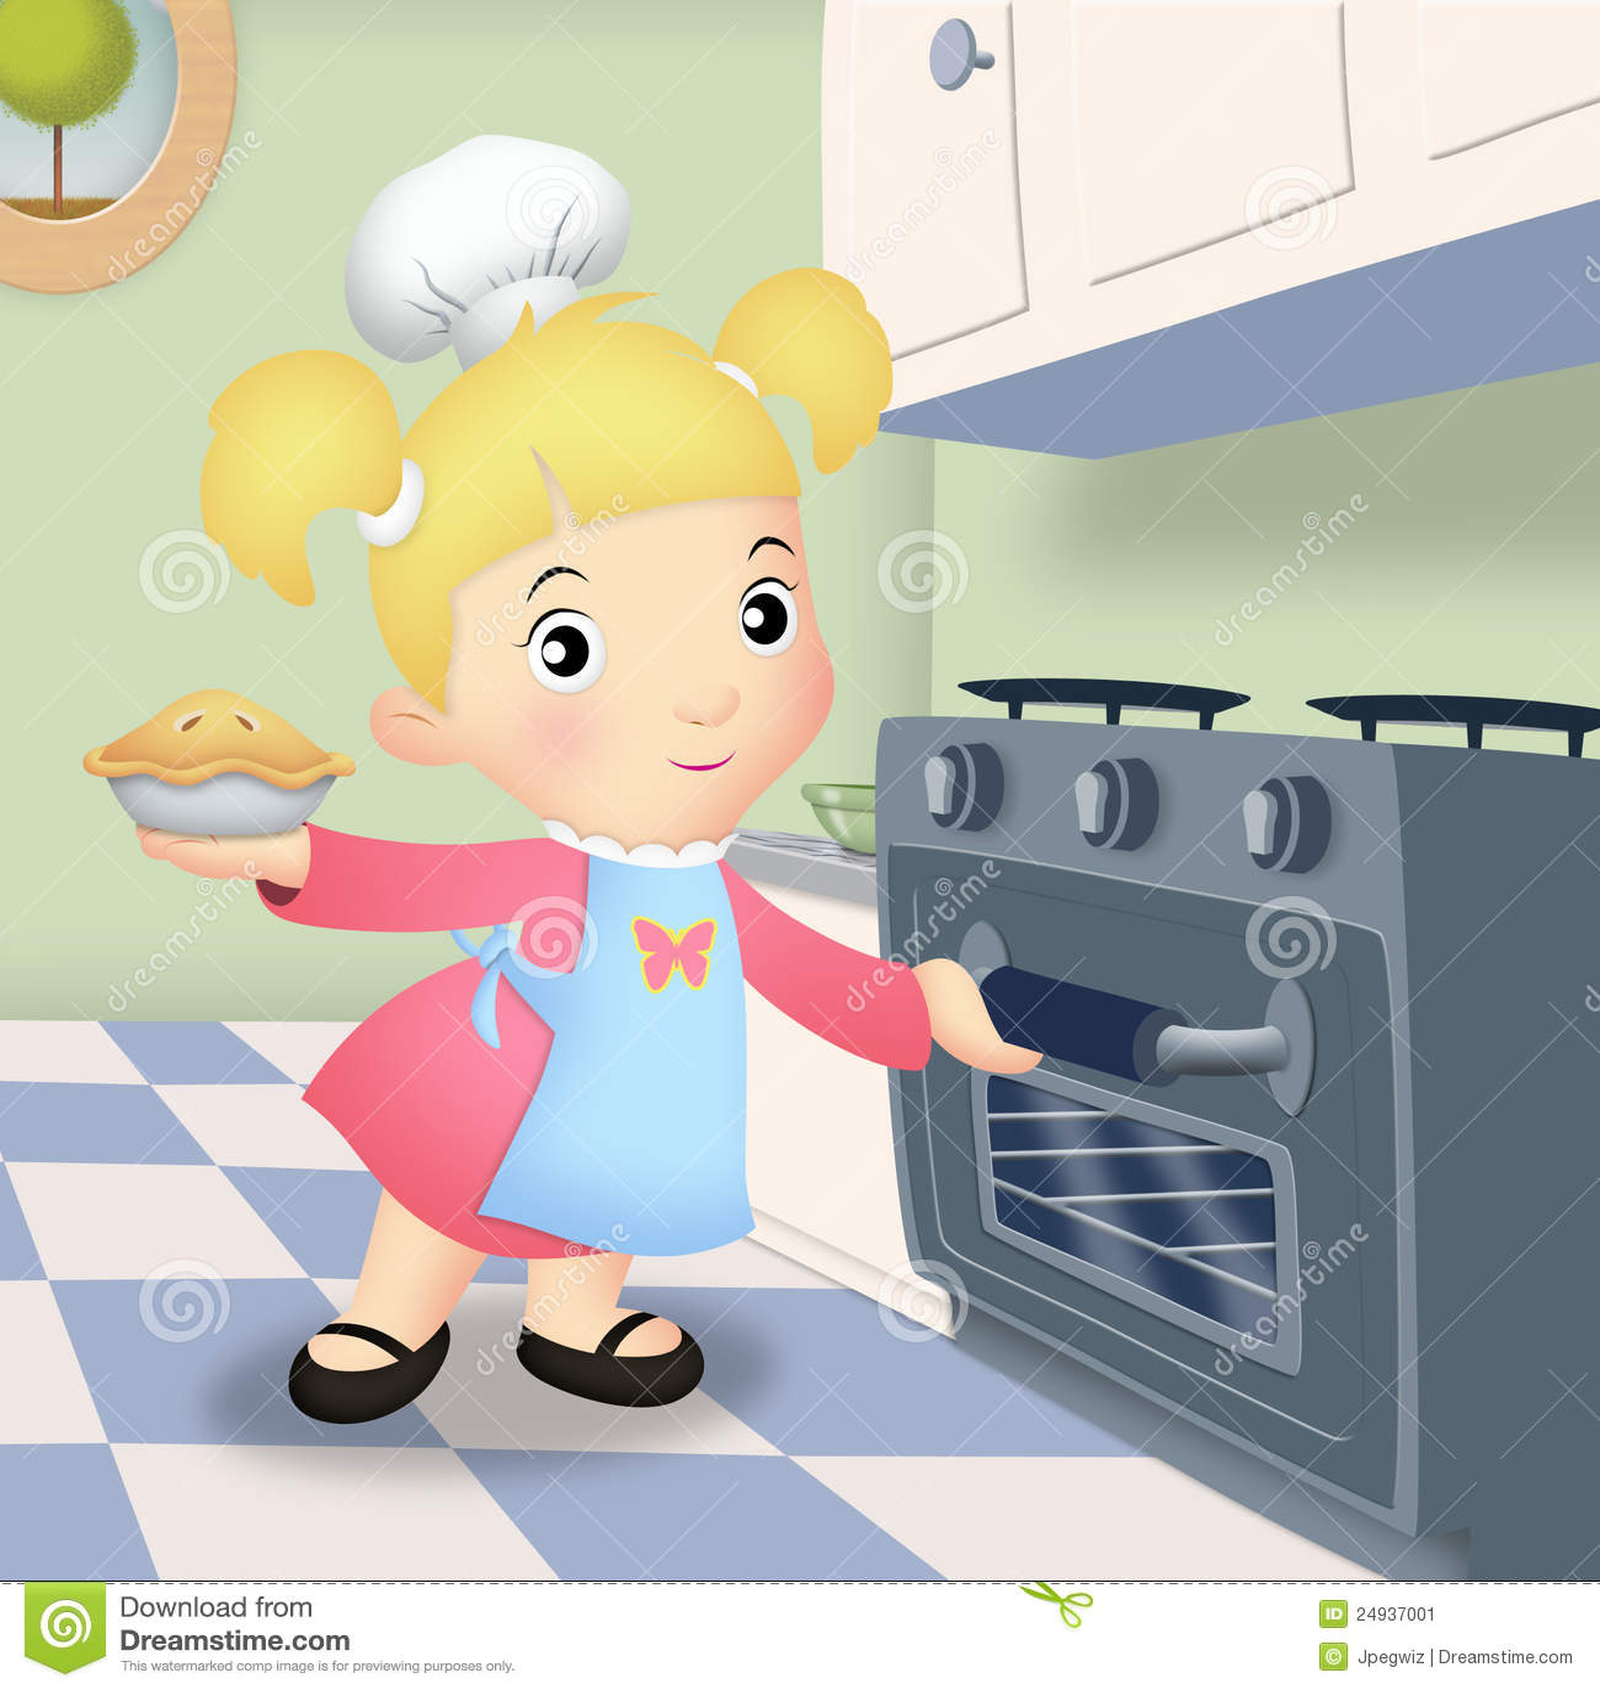 Girl Baking Stock Image - Image: 24937001